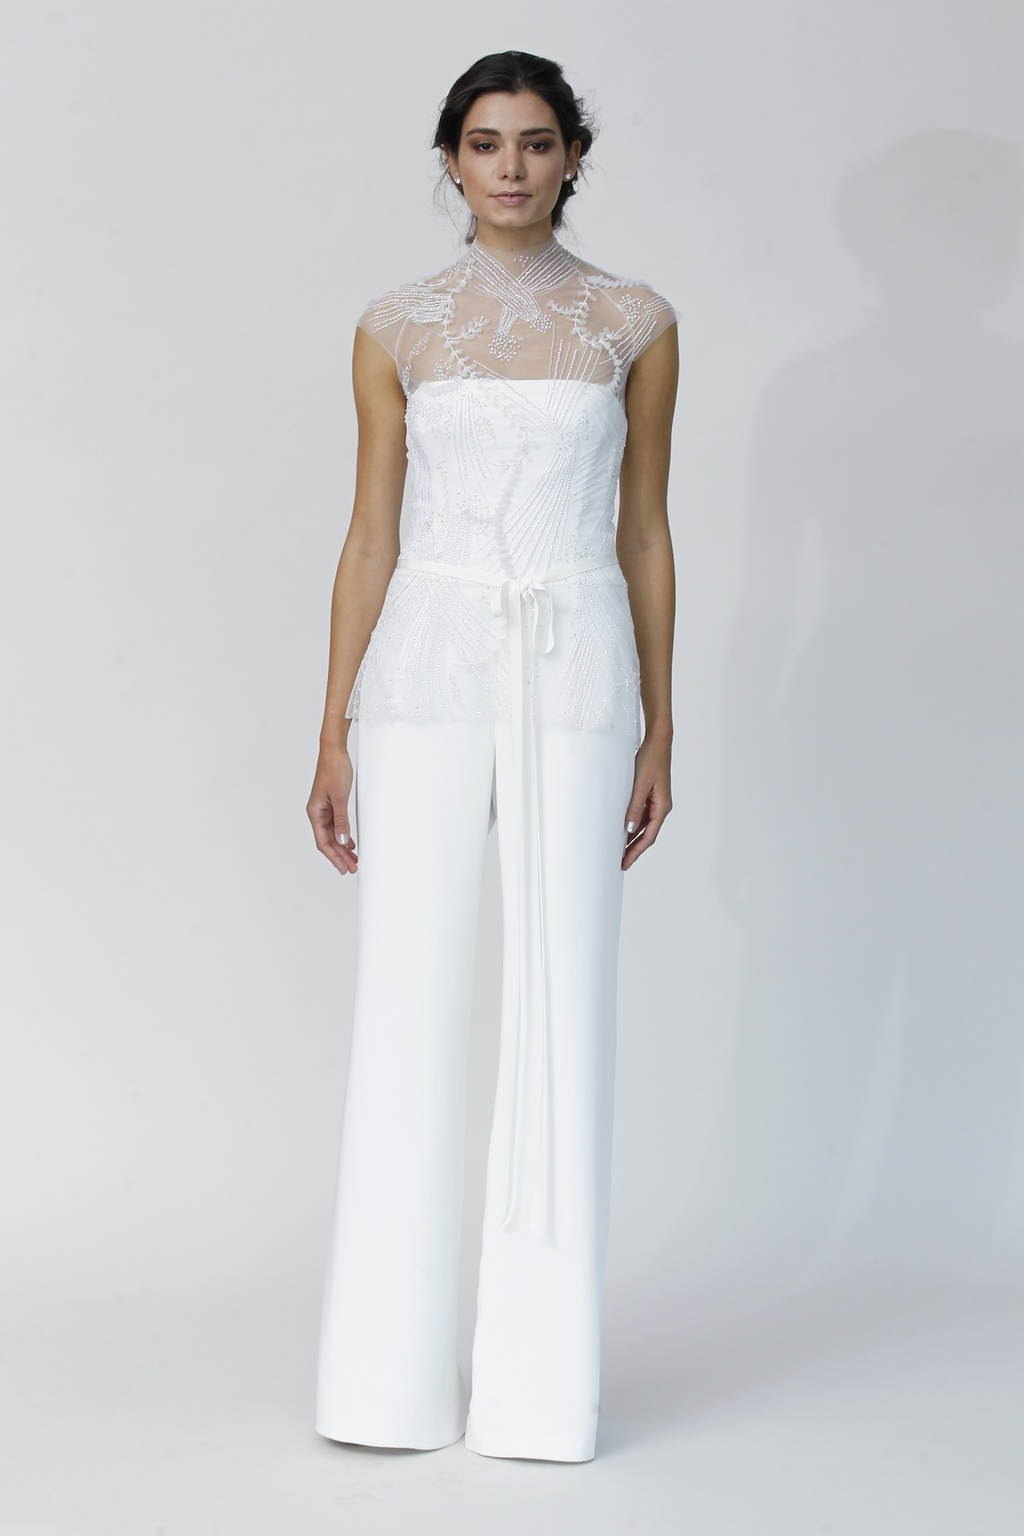 Manuela-wedding-dress-by-rivini-fall-2014-bridal.full